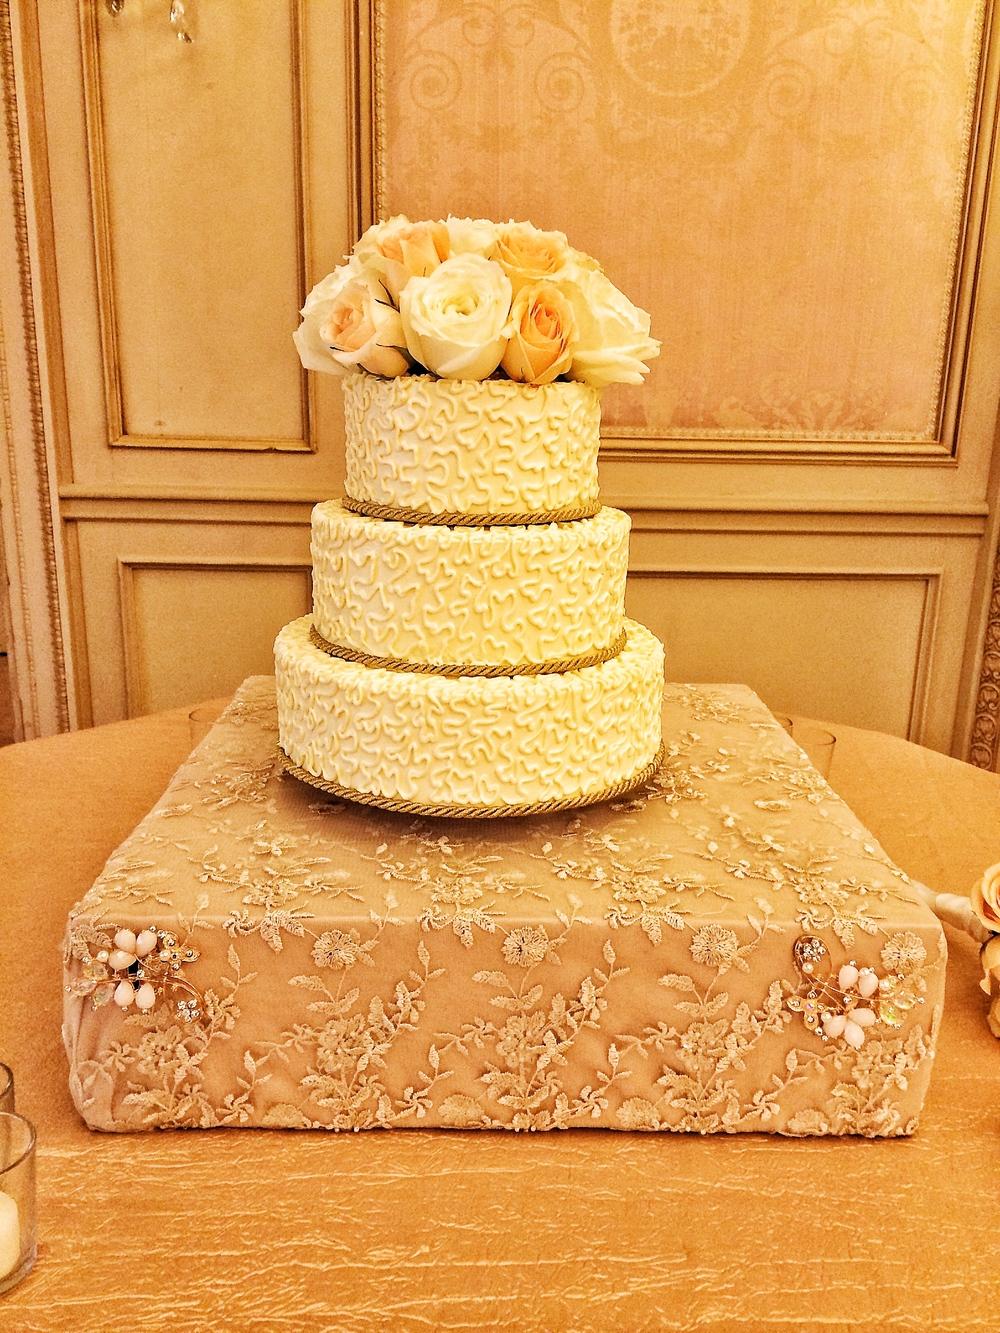 17_Cake.JPG